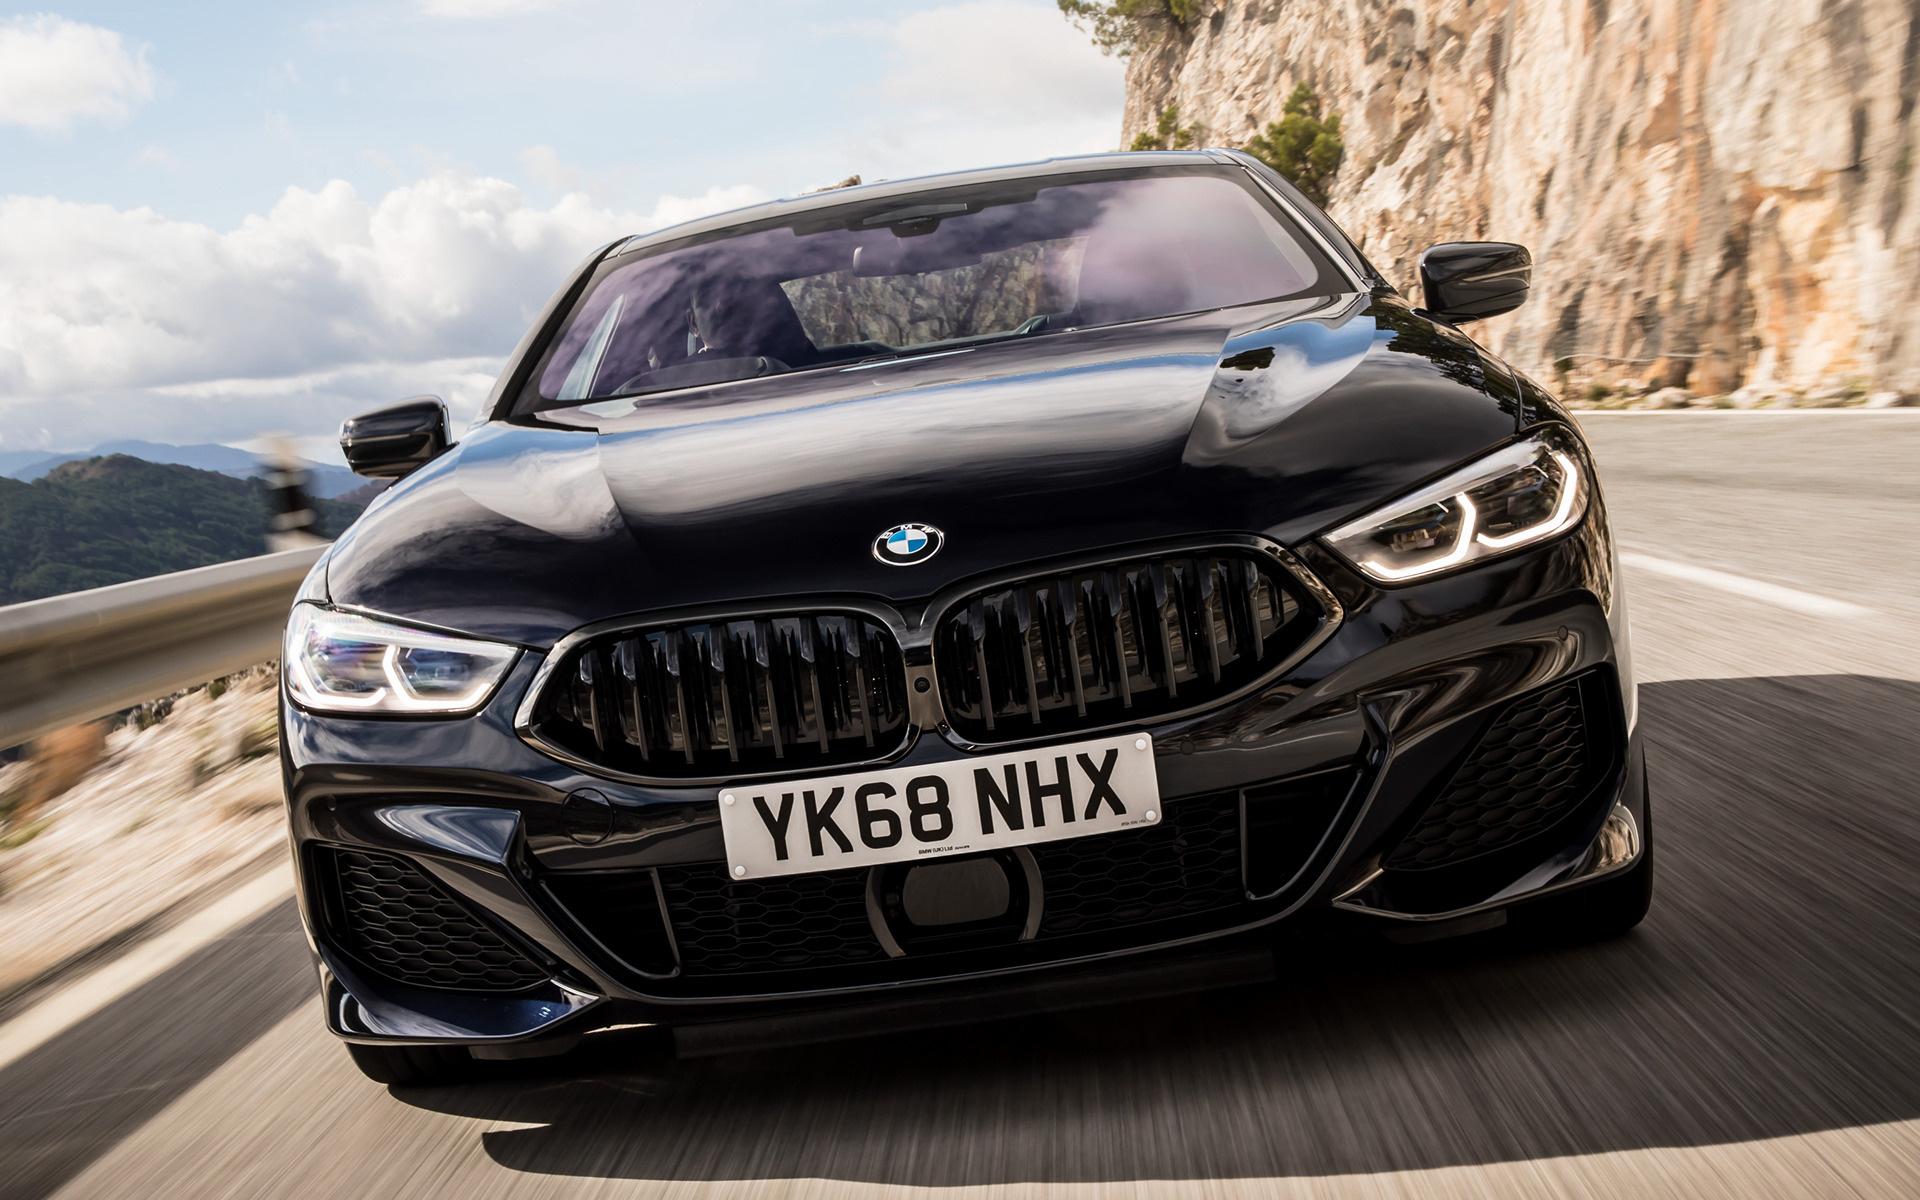 Wallpaper Mobil Bmw Sport: 2018 BMW 8 Series Coupe M Sport (UK)